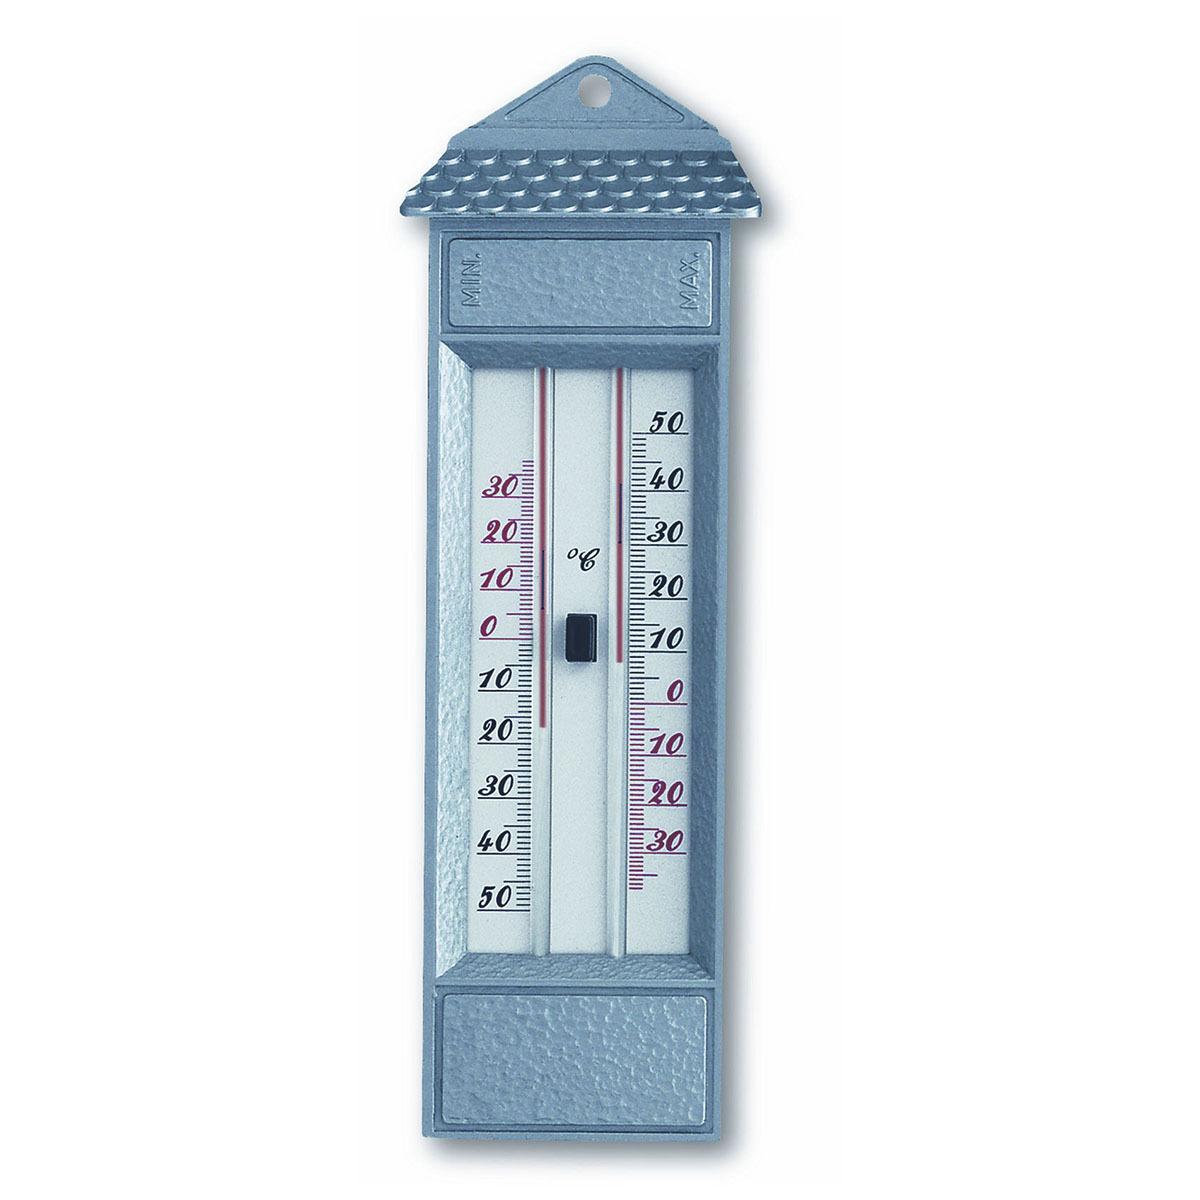 10-2006-analoges-minima-maxima-thermometer-metall-1200x1200px.jpg